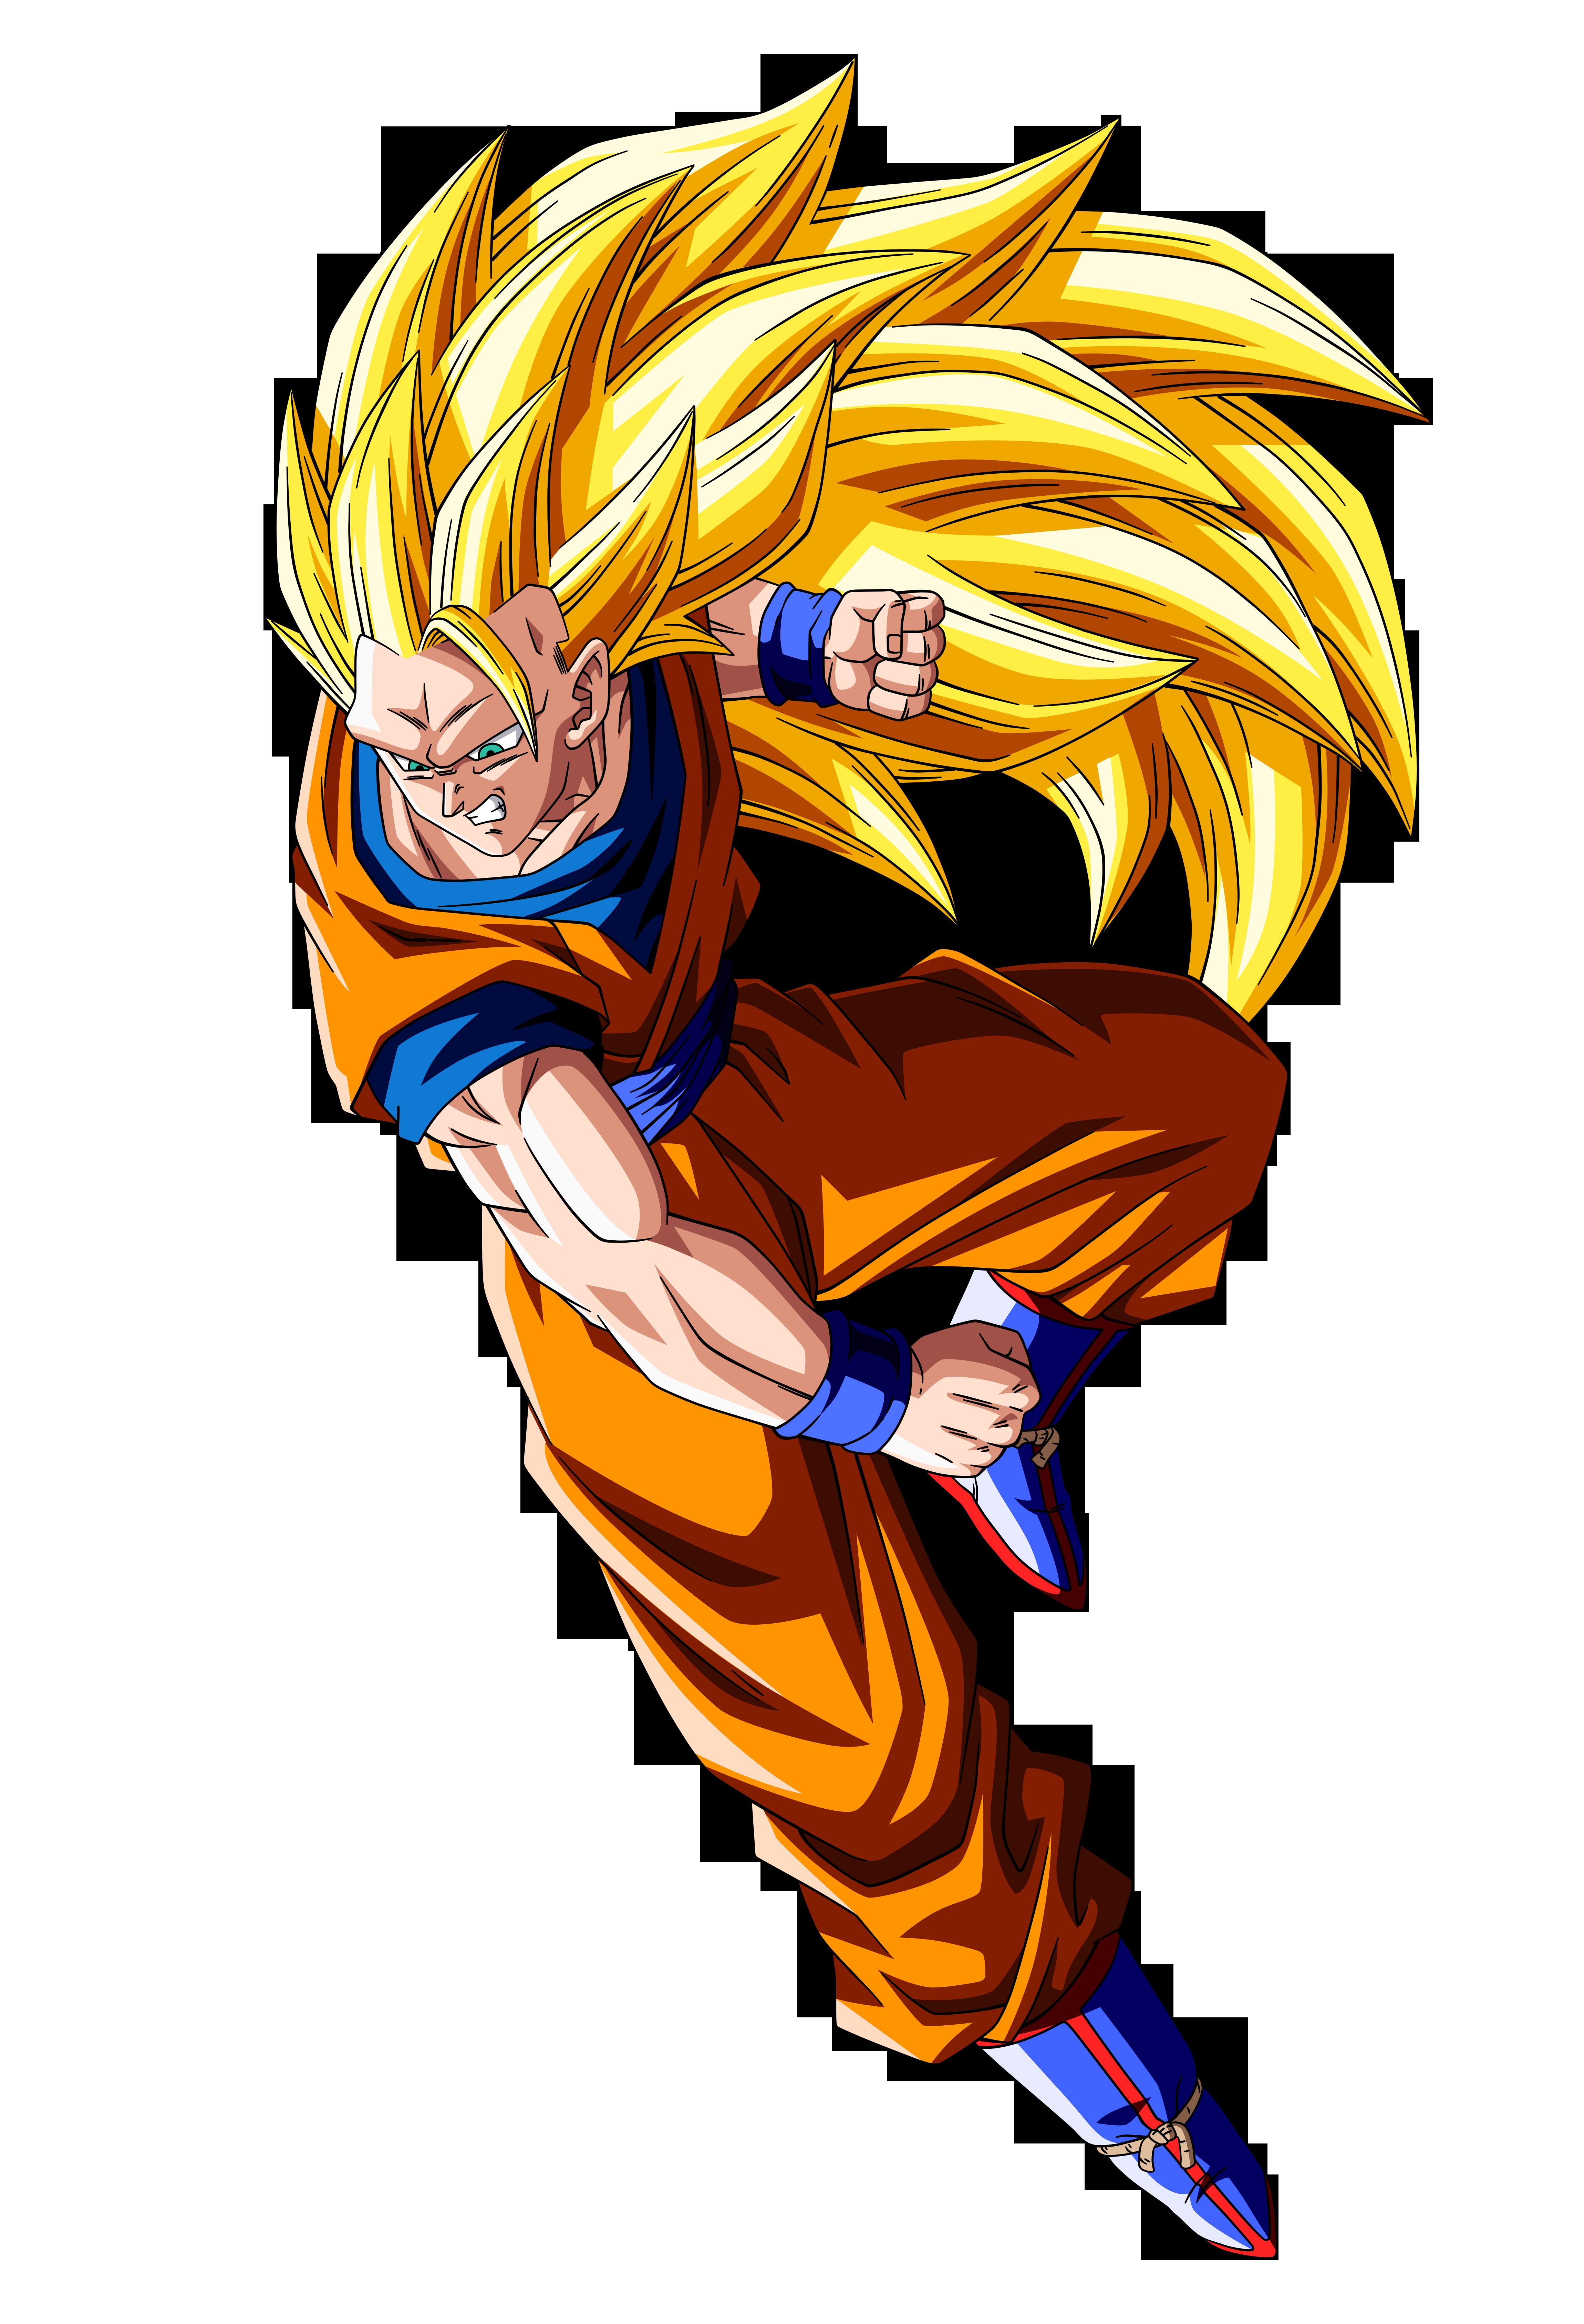 Son Goku ssj3 vs Majin Buu v.1 by orco05